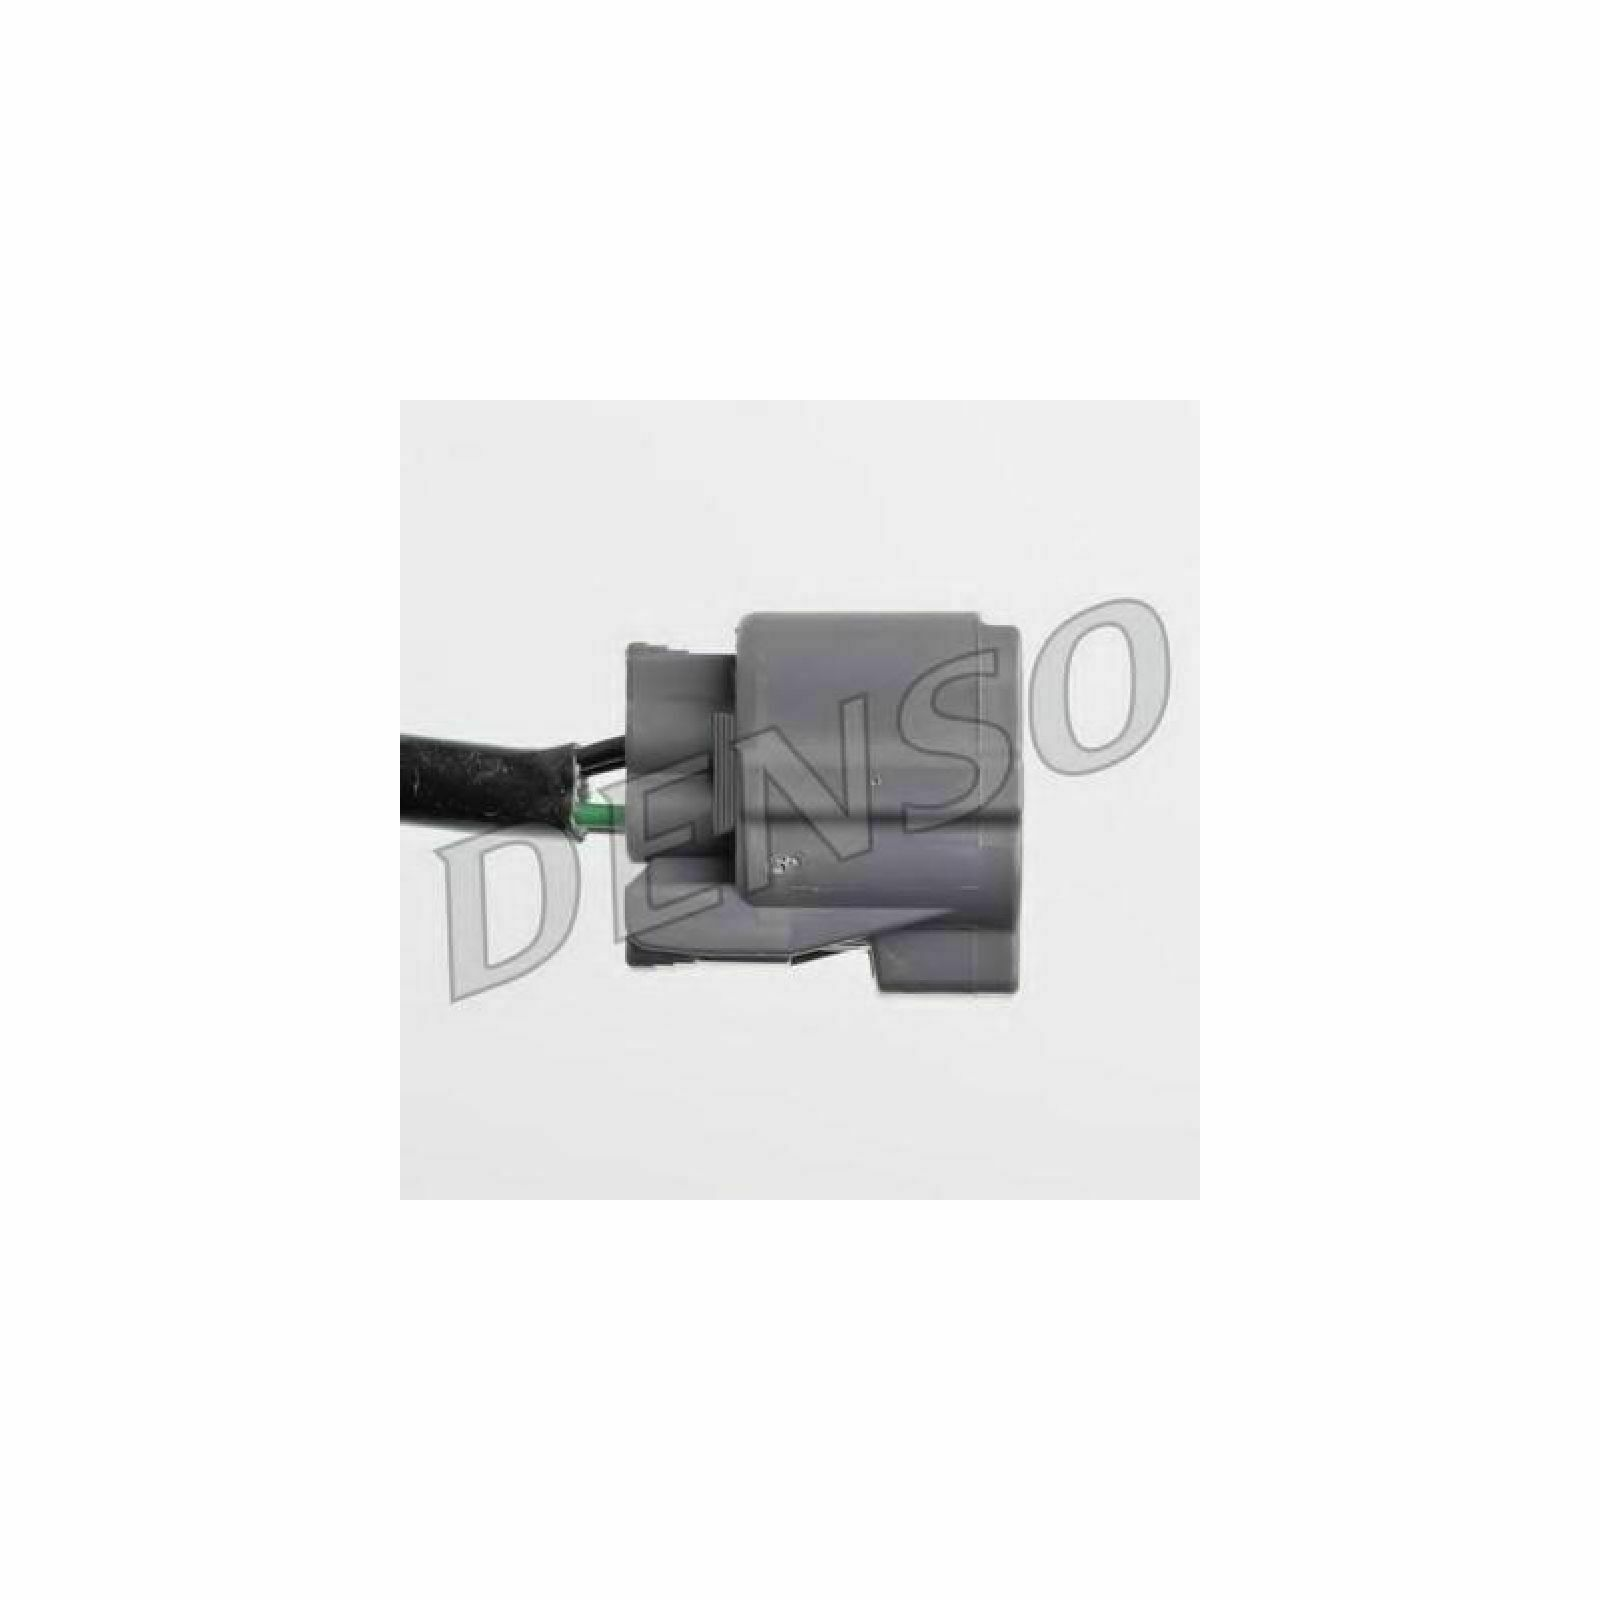 DENSO DOX-1453 GENUINE OEM LAMBDA SENSOR FOR HONDA 36531PLD003